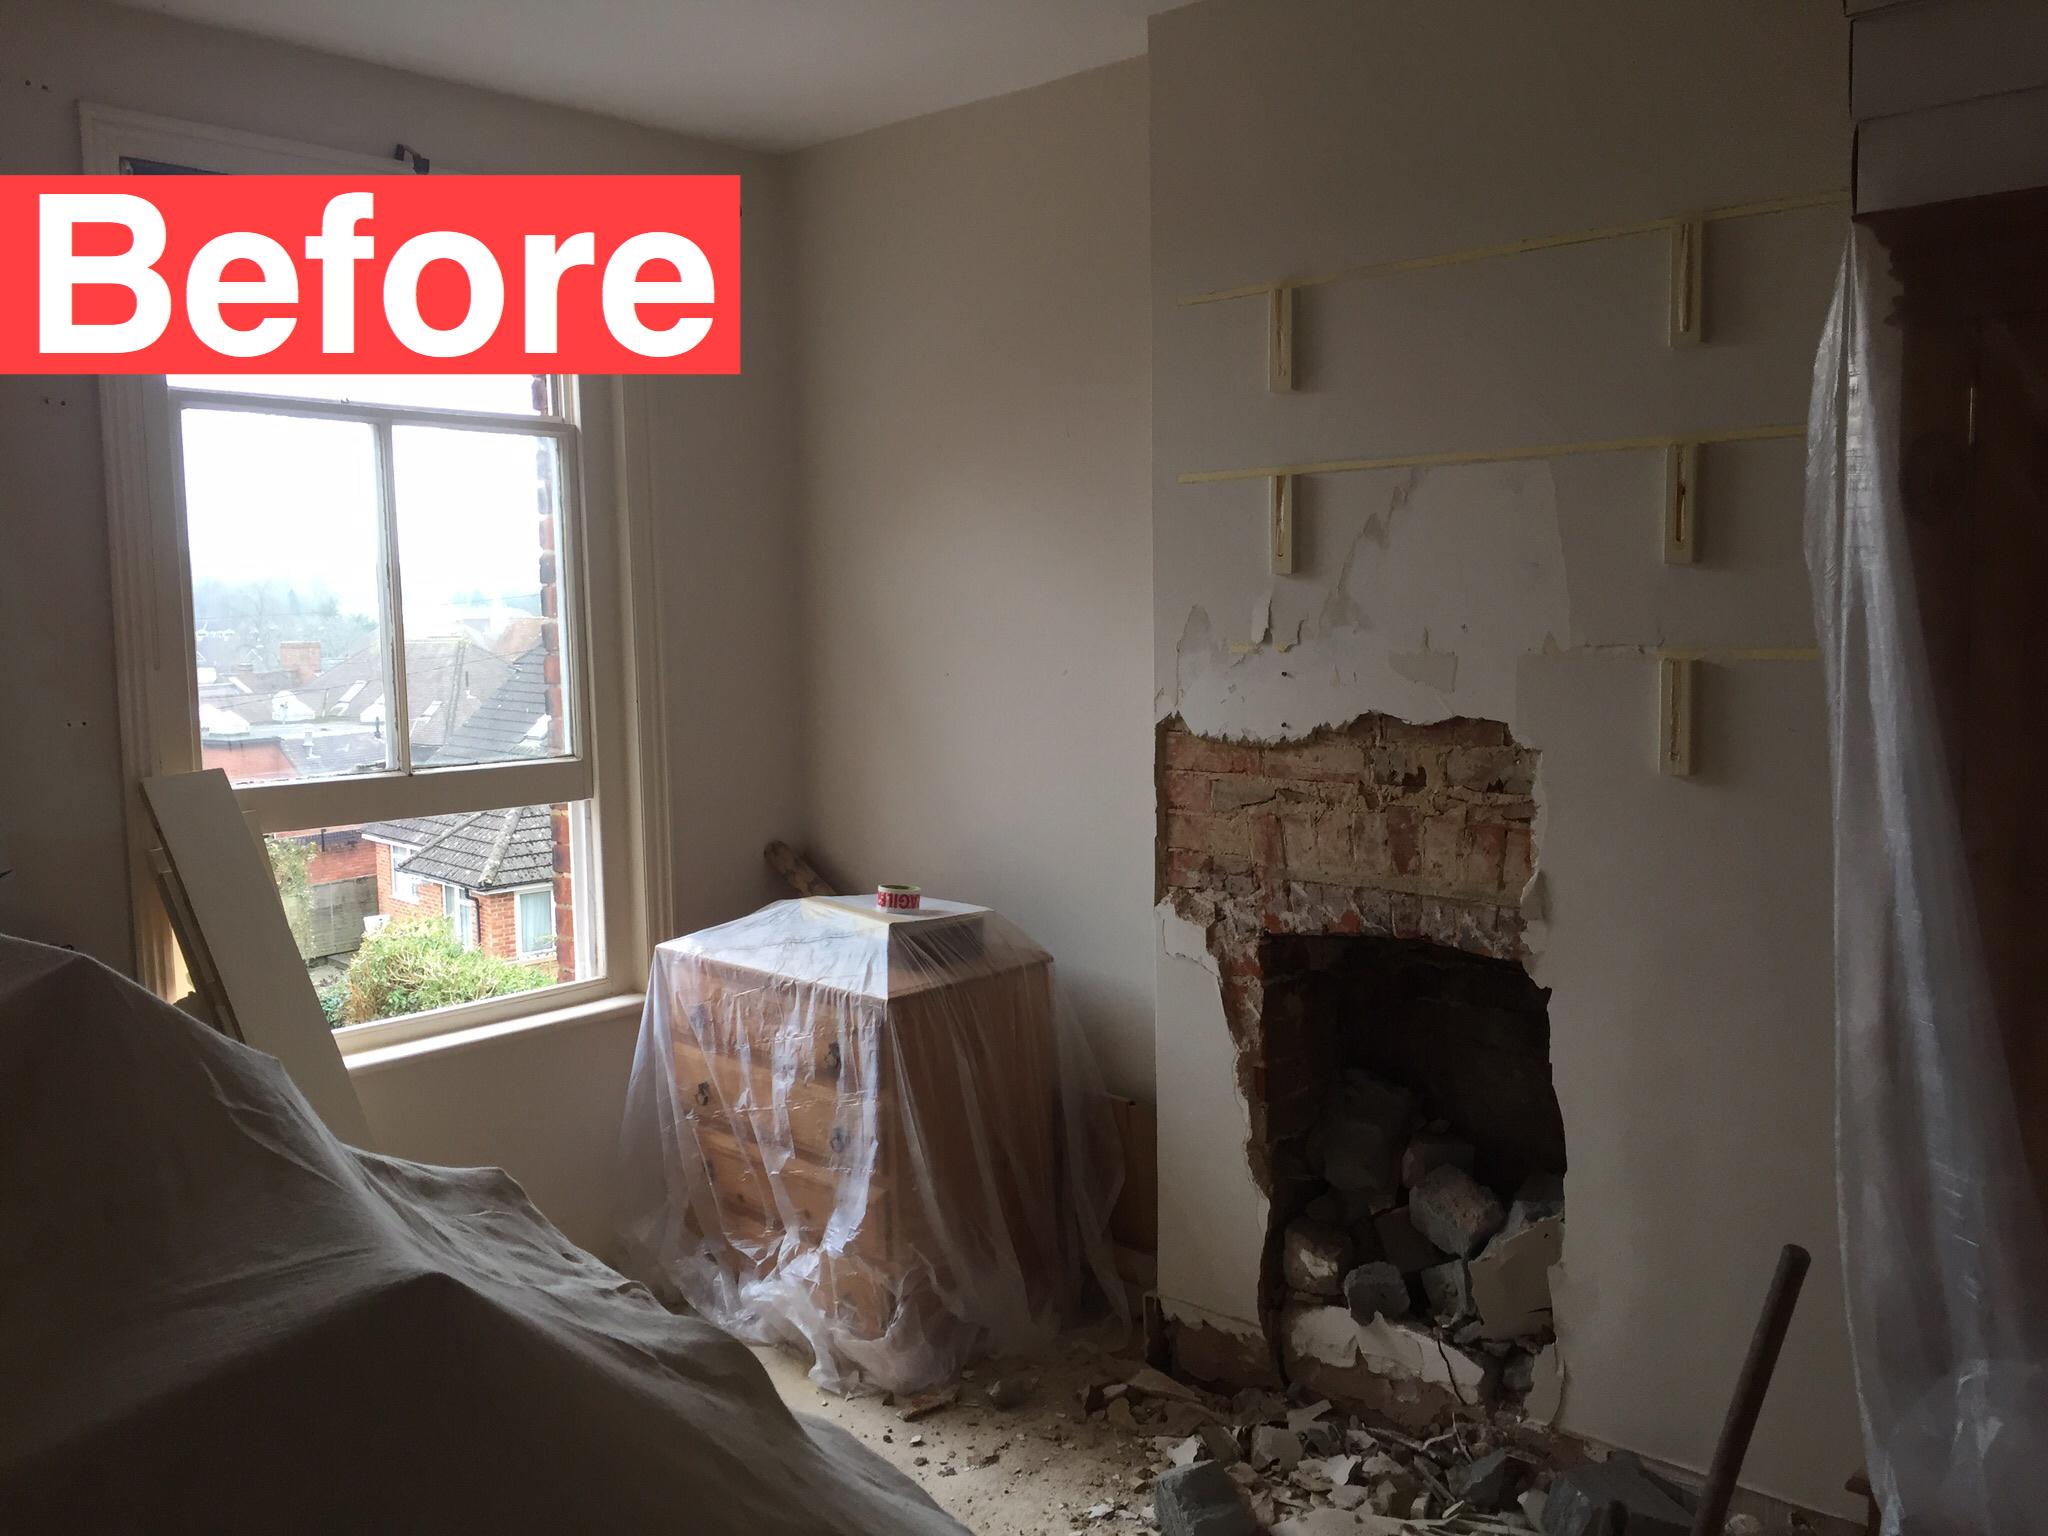 Bedroom Design & Full Refurb